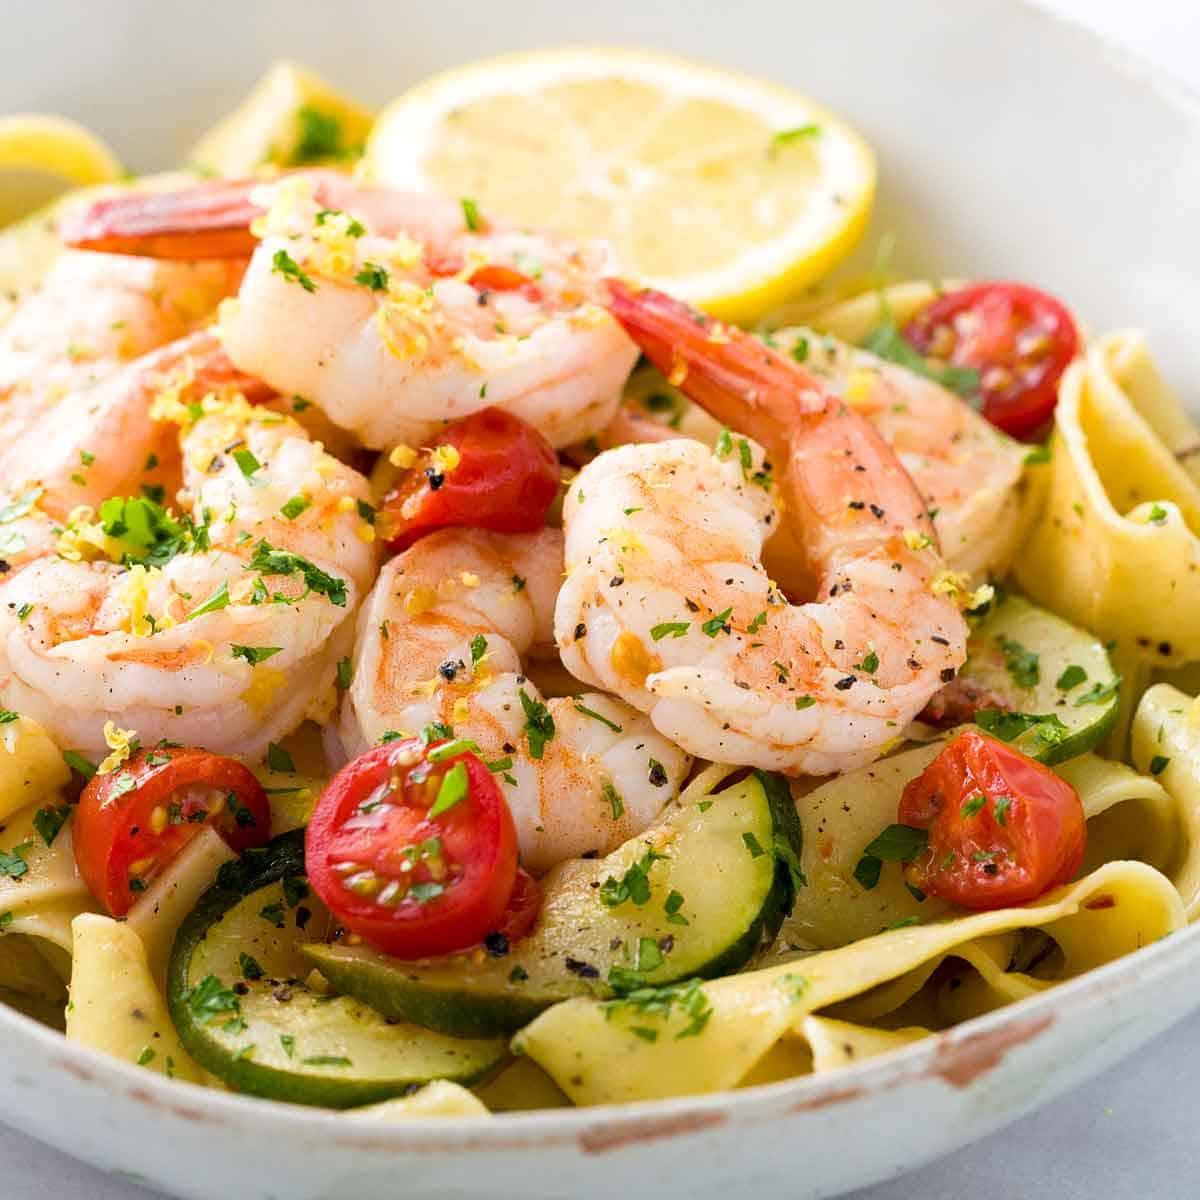 Shrimp Recipes With Pasta  Shrimp Pasta with Lemon Garlic Sauce